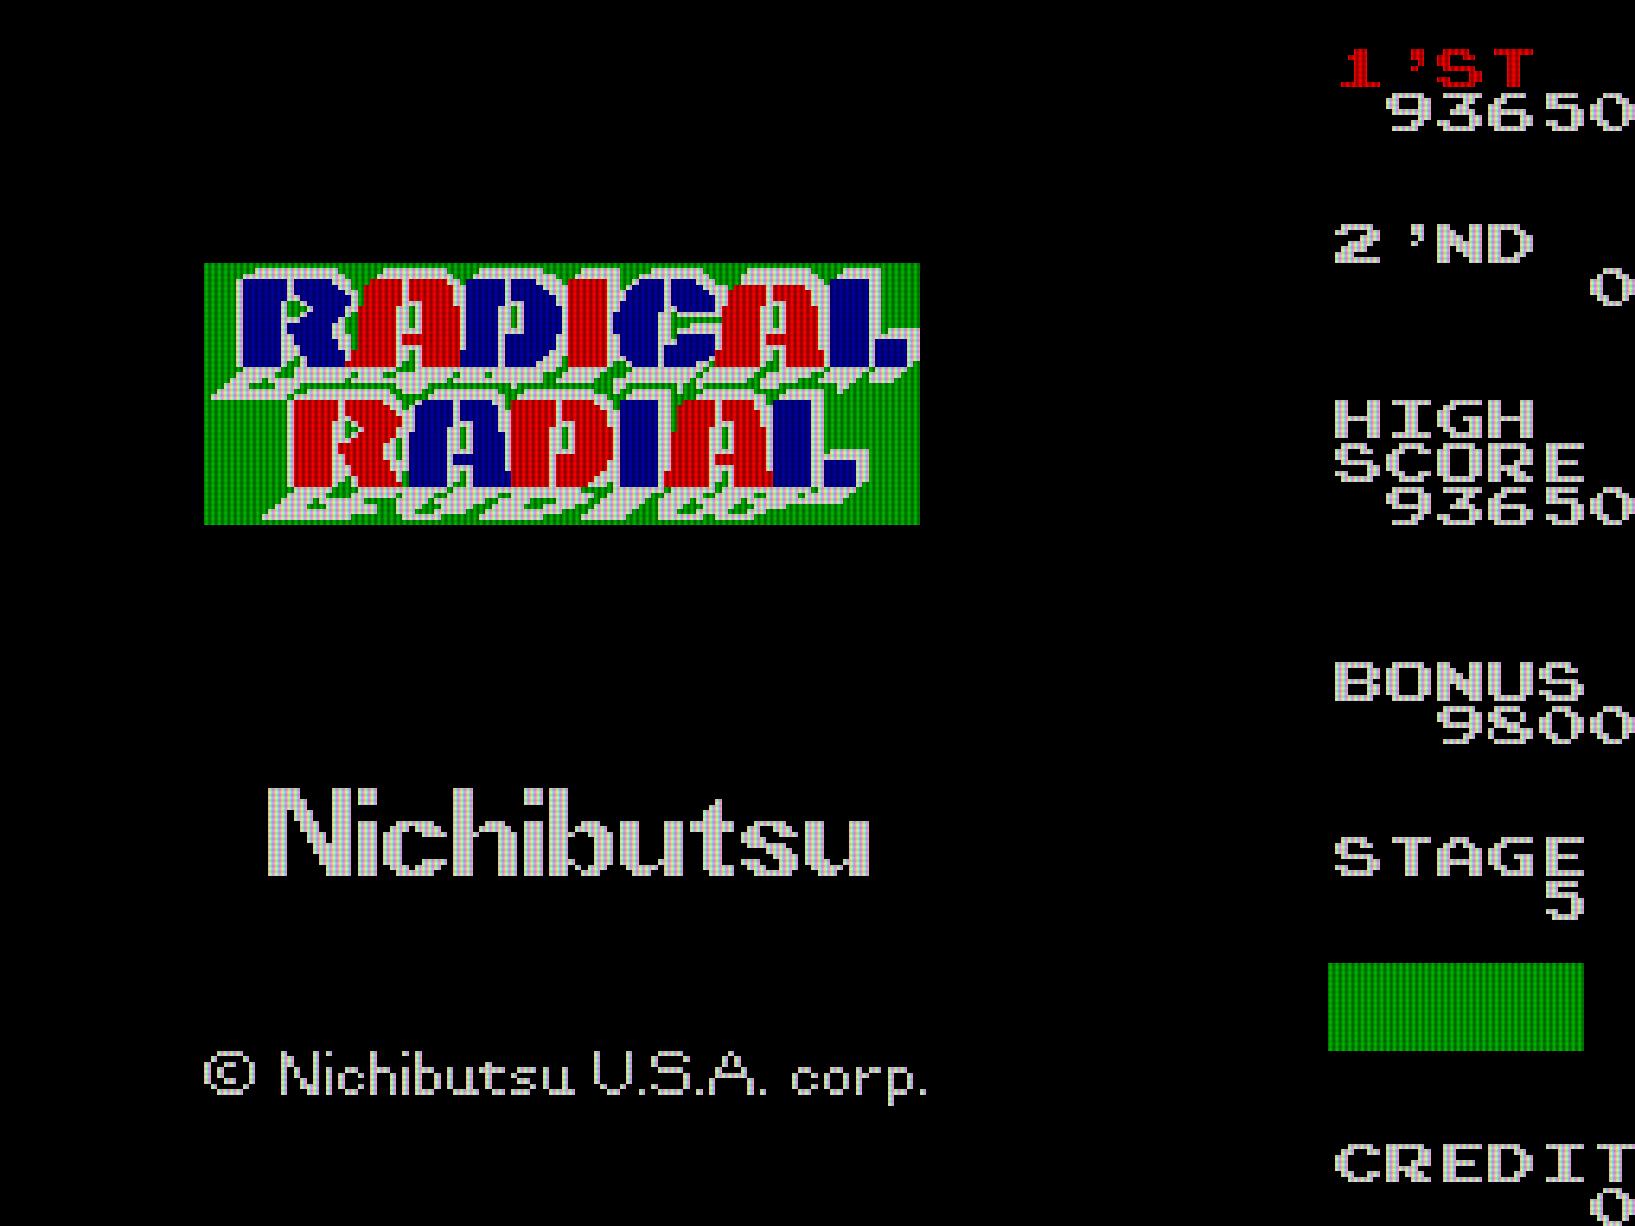 Shige: Radical Radial [radrad] (Arcade Emulated / M.A.M.E.) 93,650 points on 2014-09-20 15:10:05